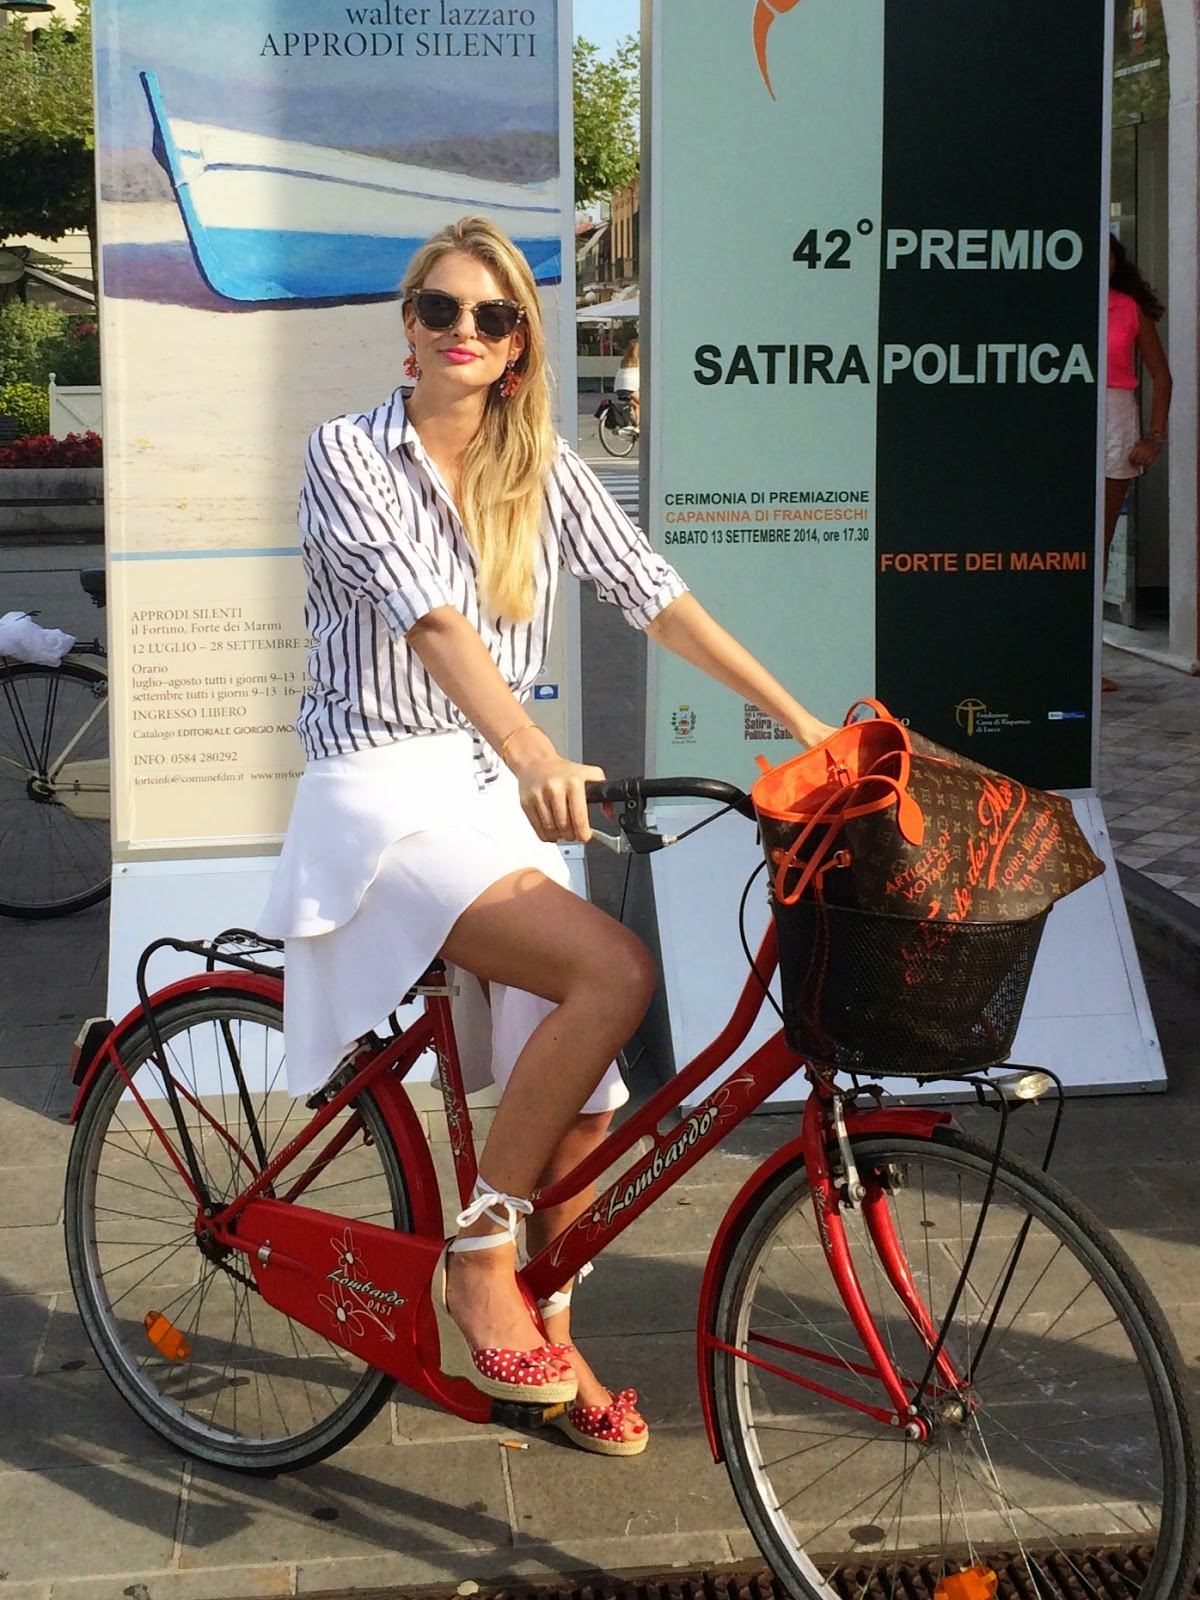 miu miu sunglasses, bicycle, tommy hilfiger shoes, espadrilles, white skirt, hm trend skirt, striped shirt, louis vuitton, louis vuitton neverful